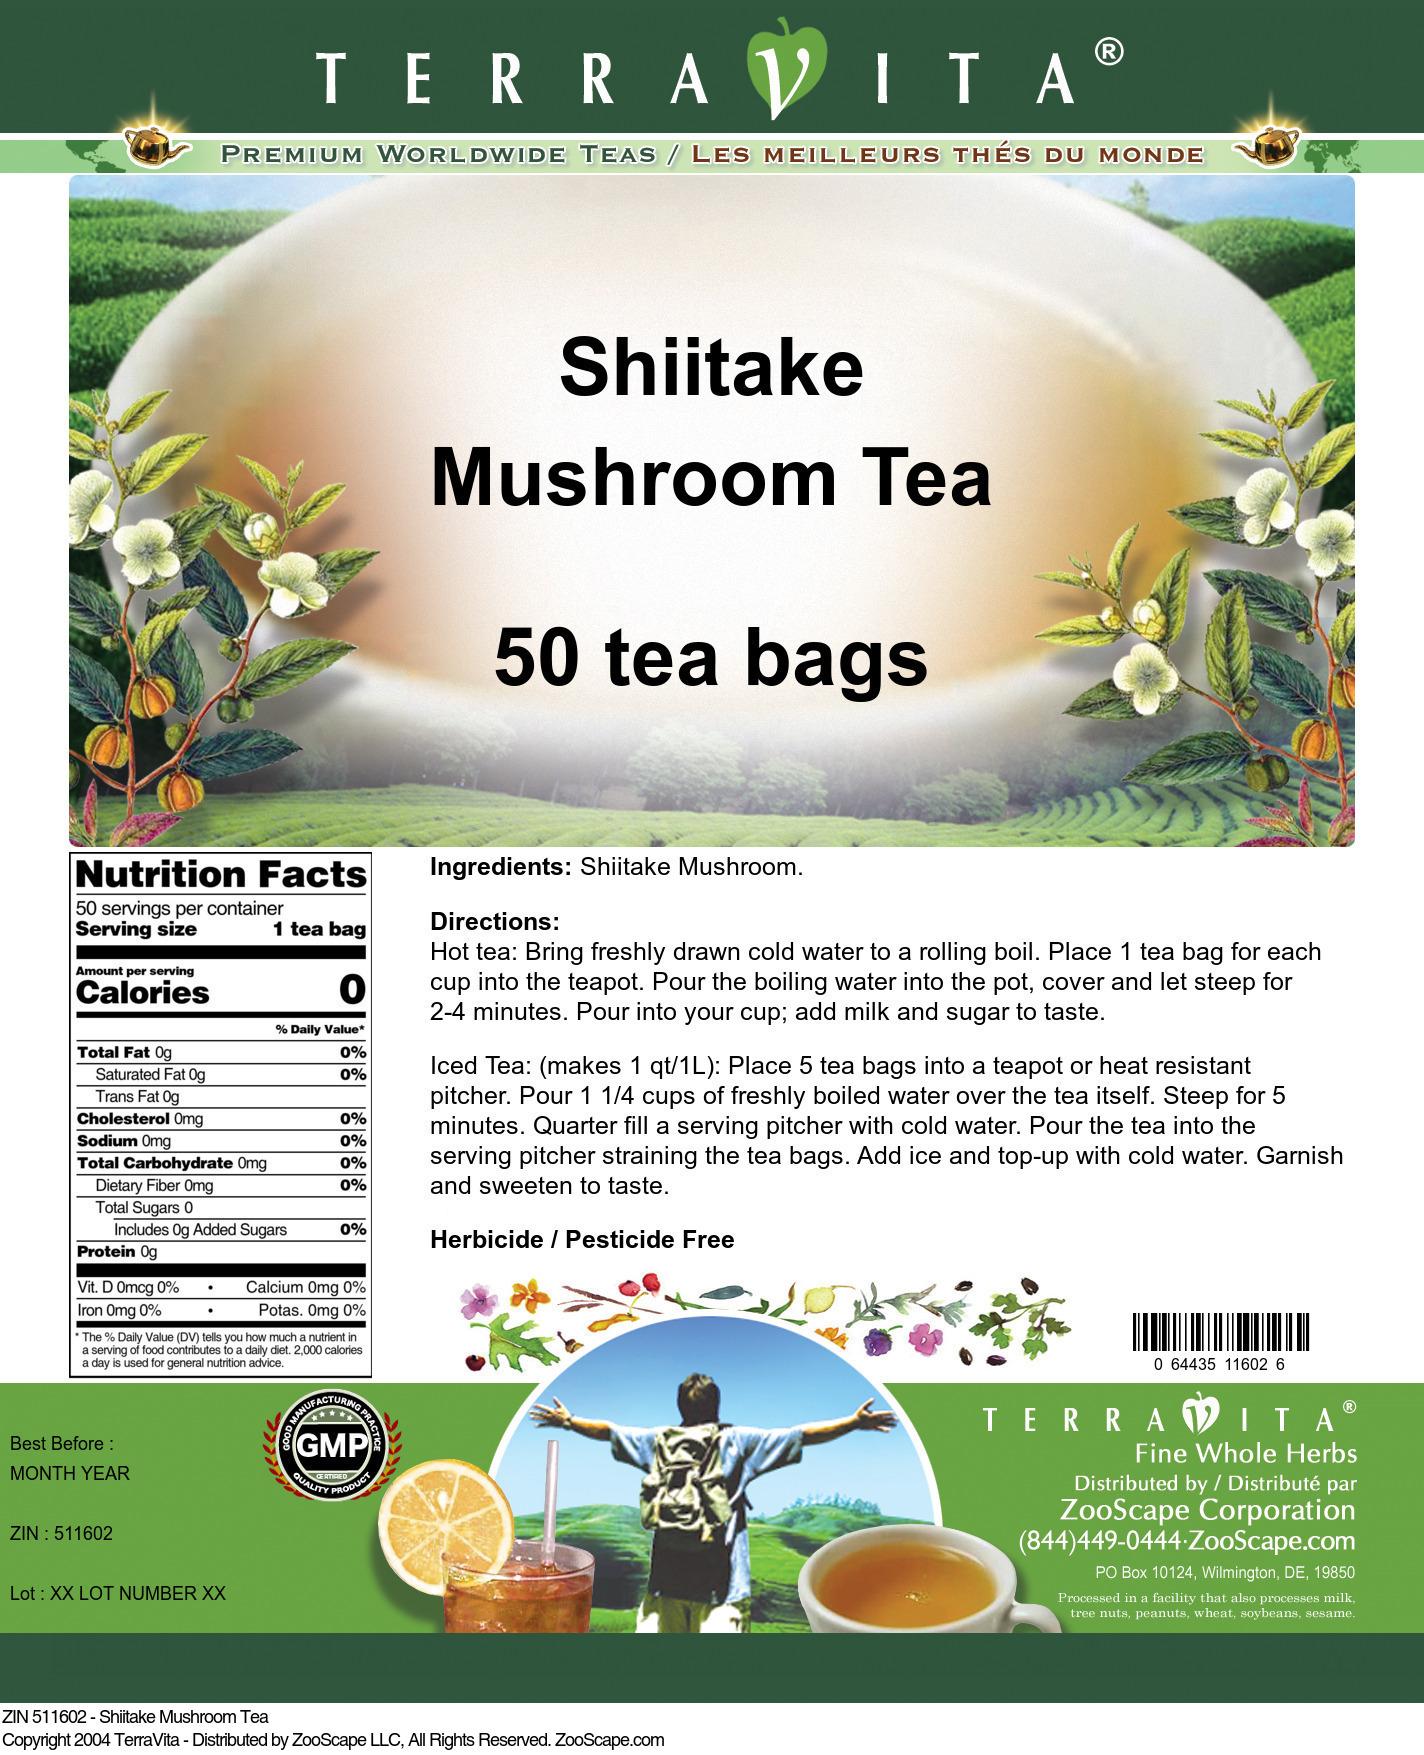 Shiitake Mushroom Tea